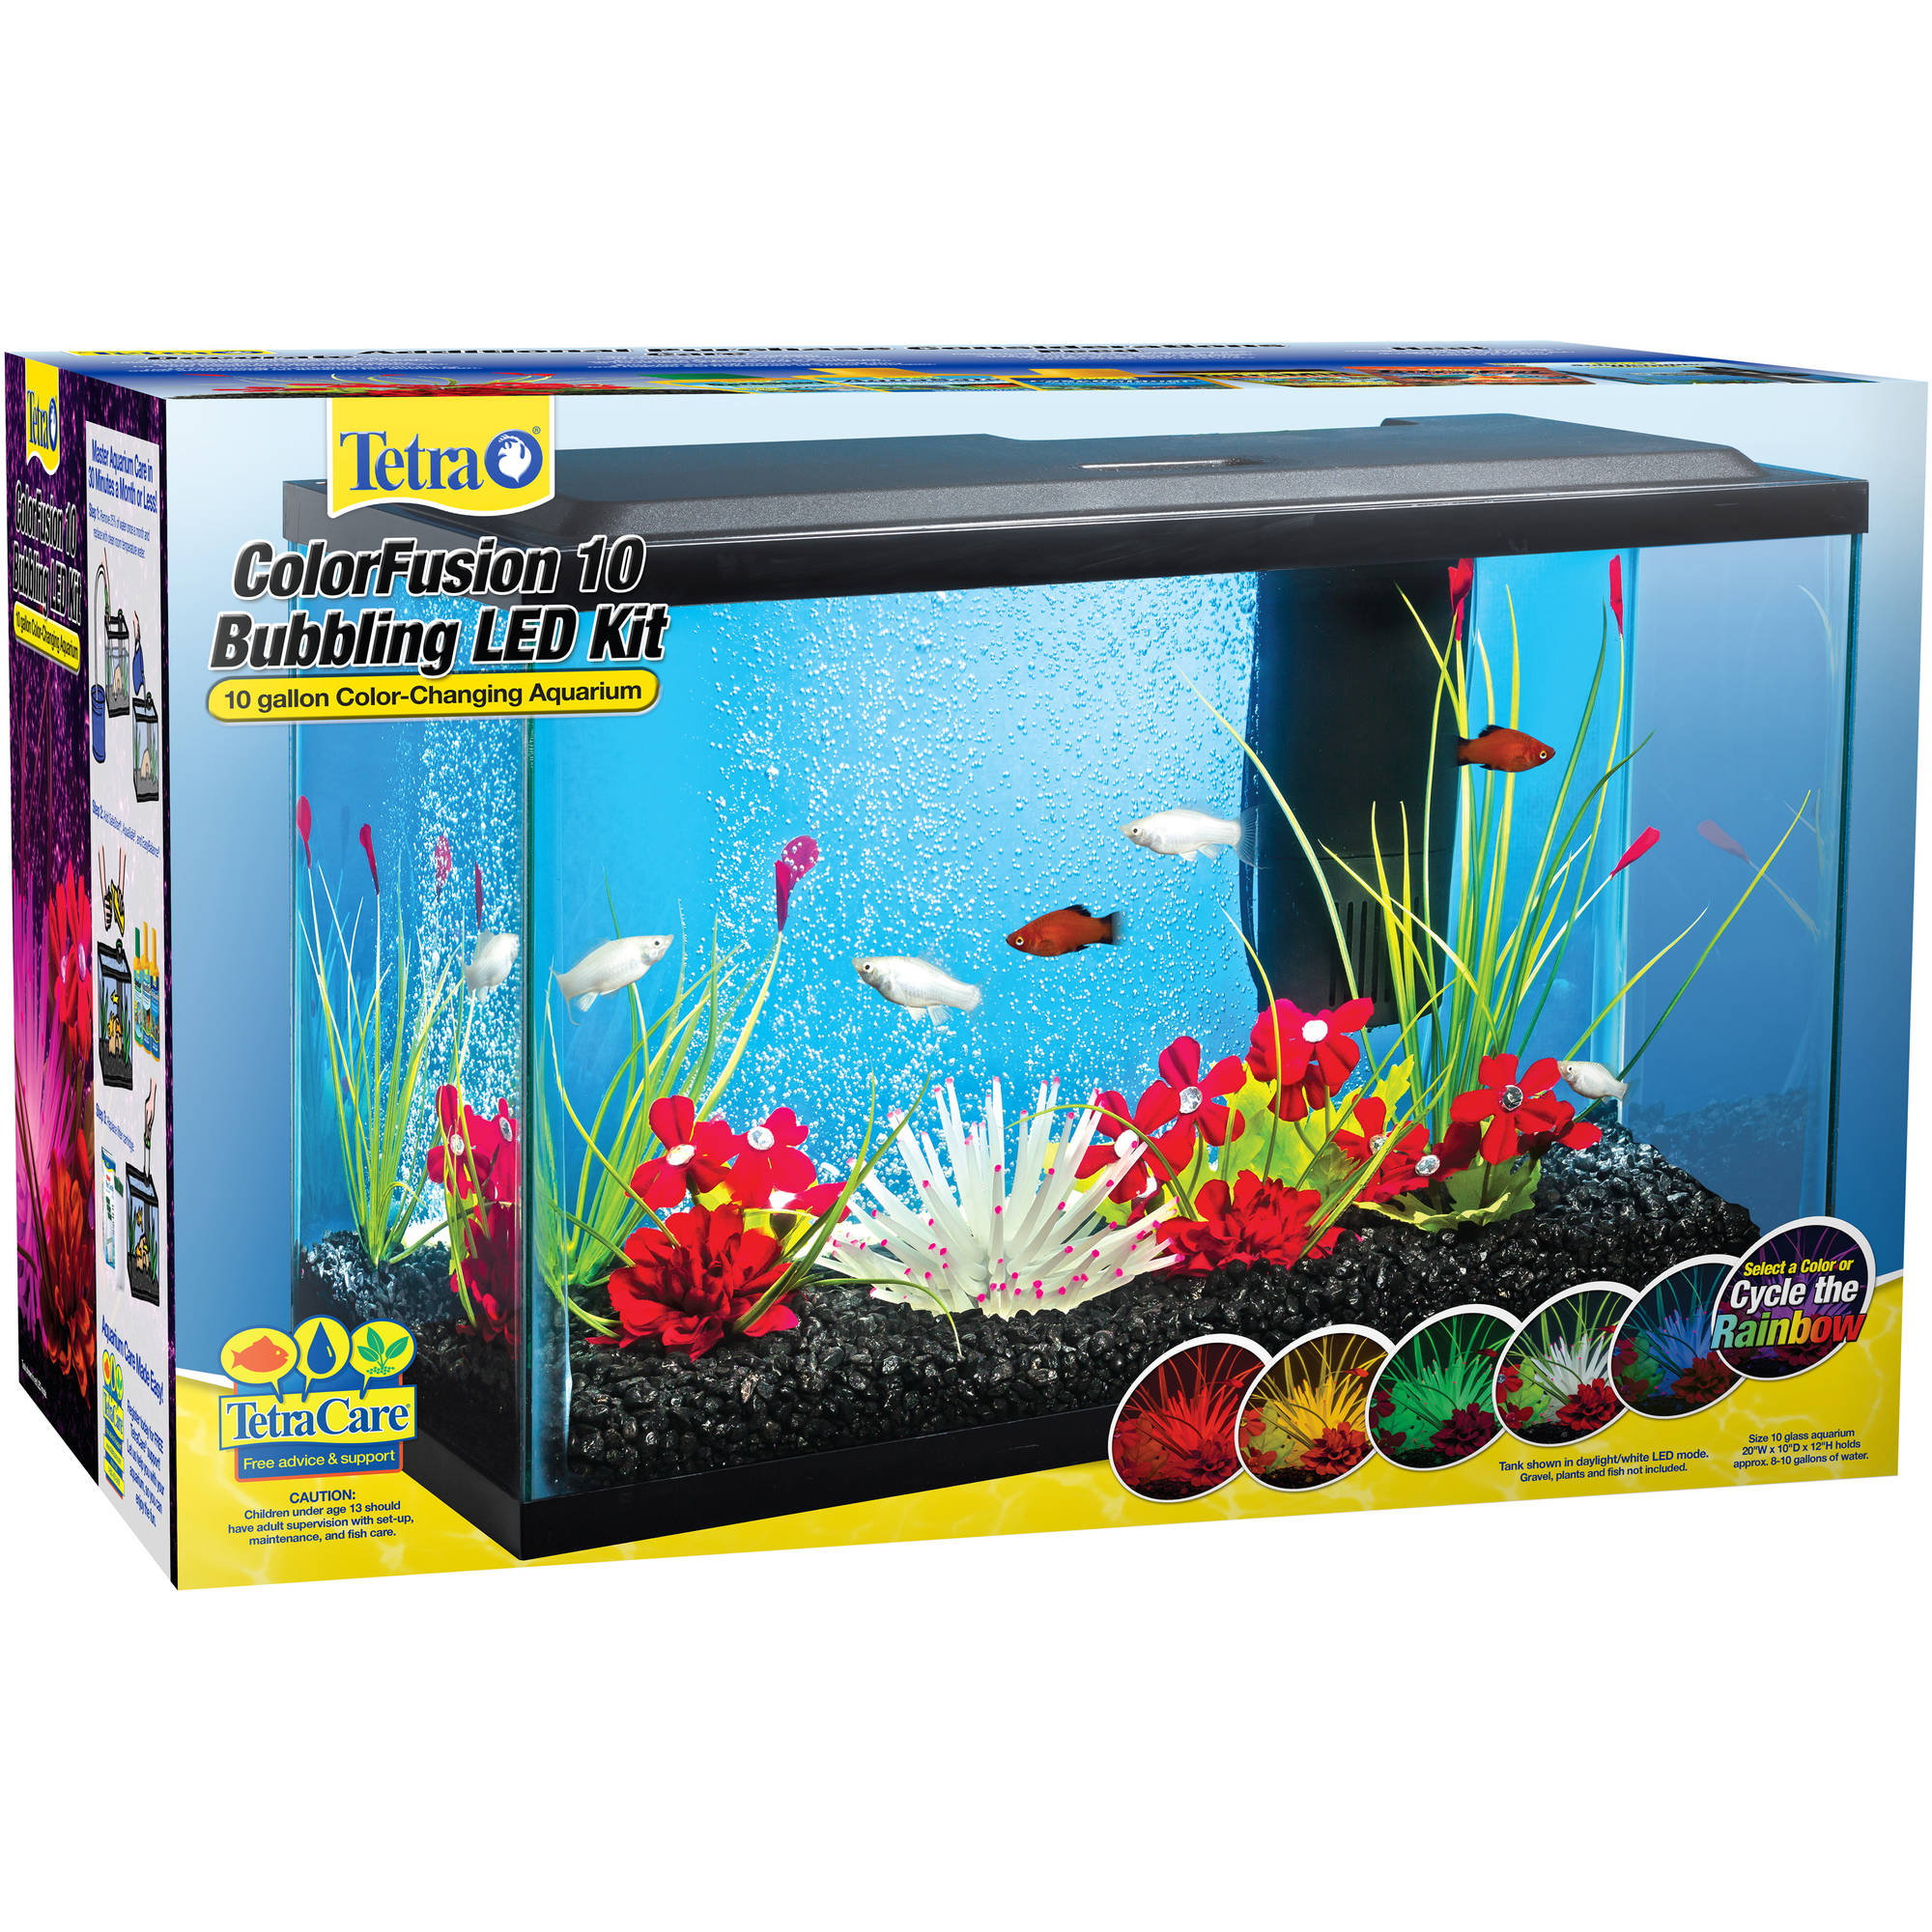 Tetra 10-Gallon ColorFusion Glass Bubbling Aquarium Starter Kit with LED